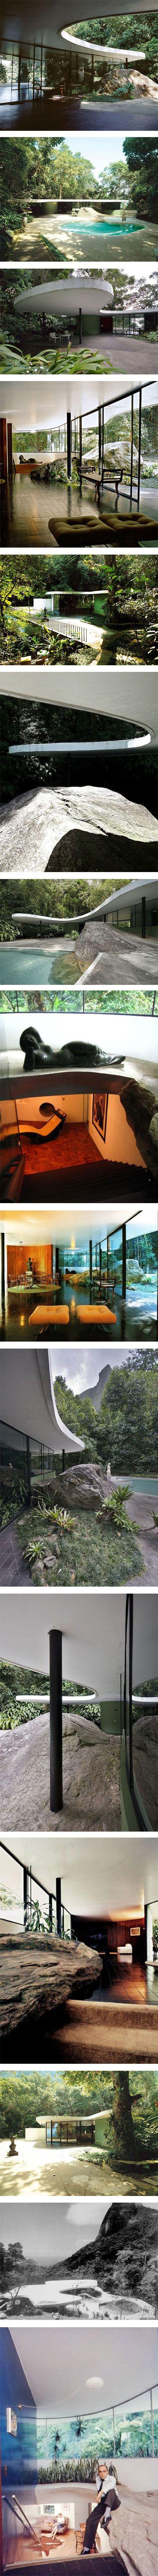 1482 best Architektur images on Pinterest